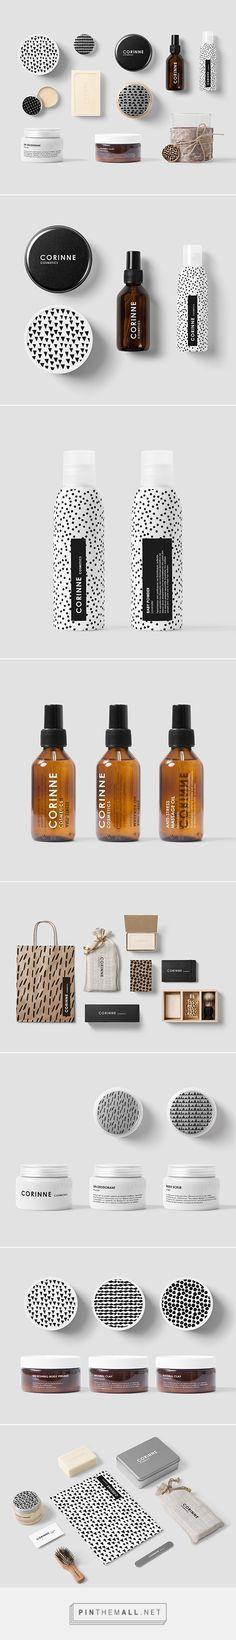 Lovely makeup packaging design